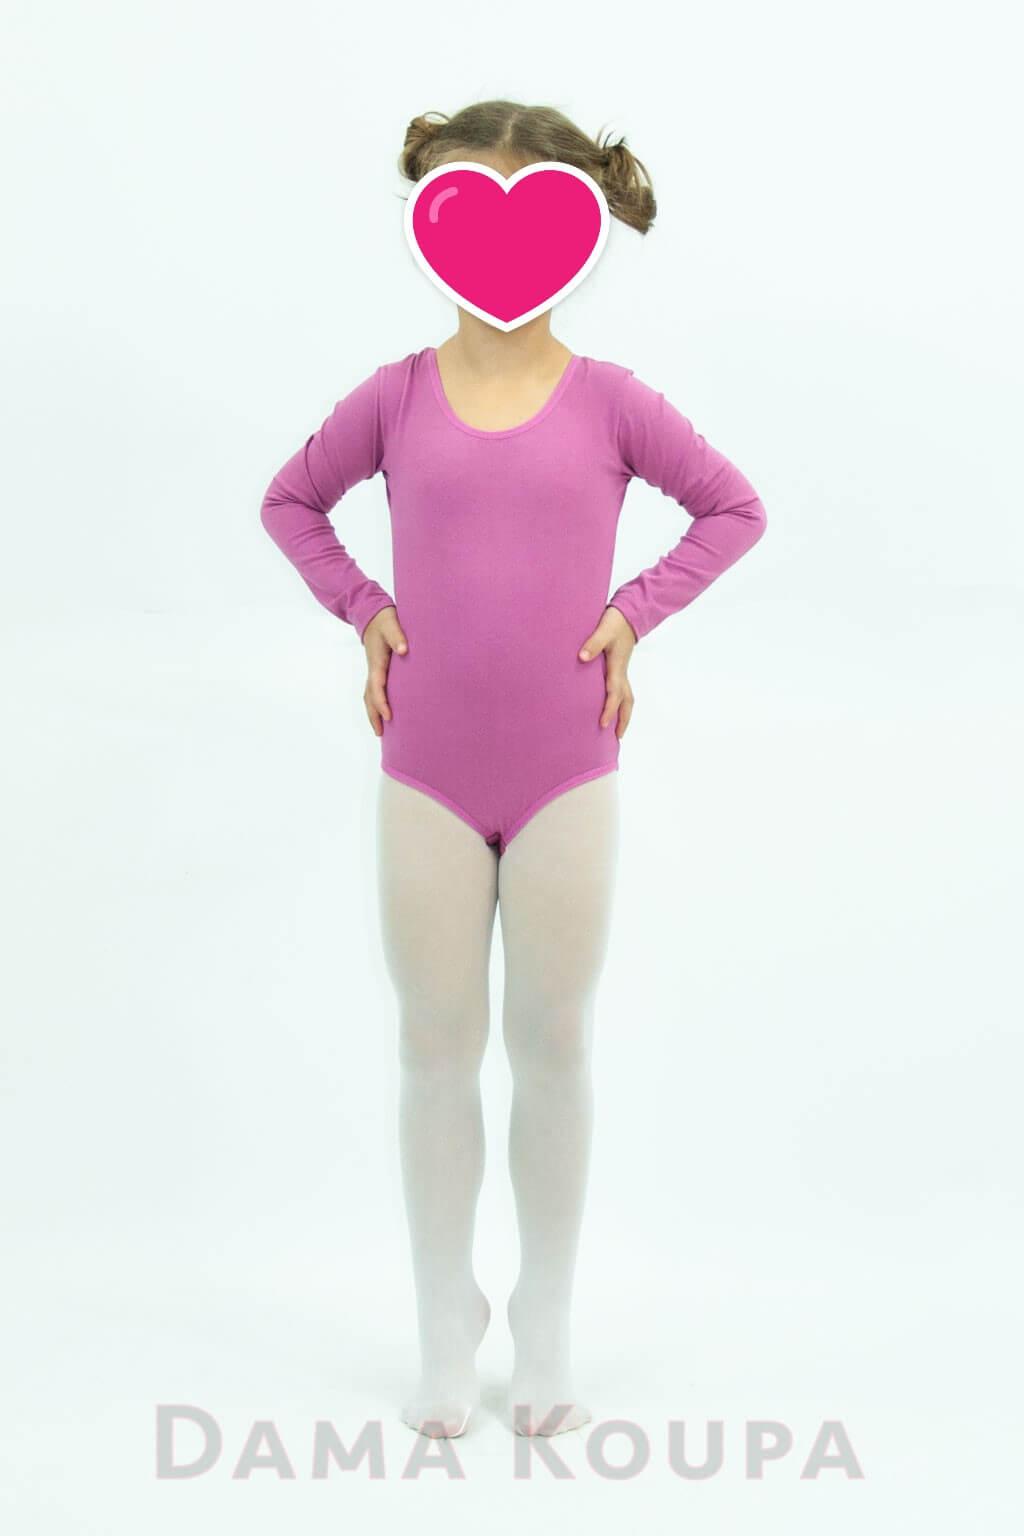 c5af2a38c04 Παιδικό κορμάκι χορού σε ροζ χρώμα Παιδικό κορμάκι μπαλέτου με μακρύ μανίκι